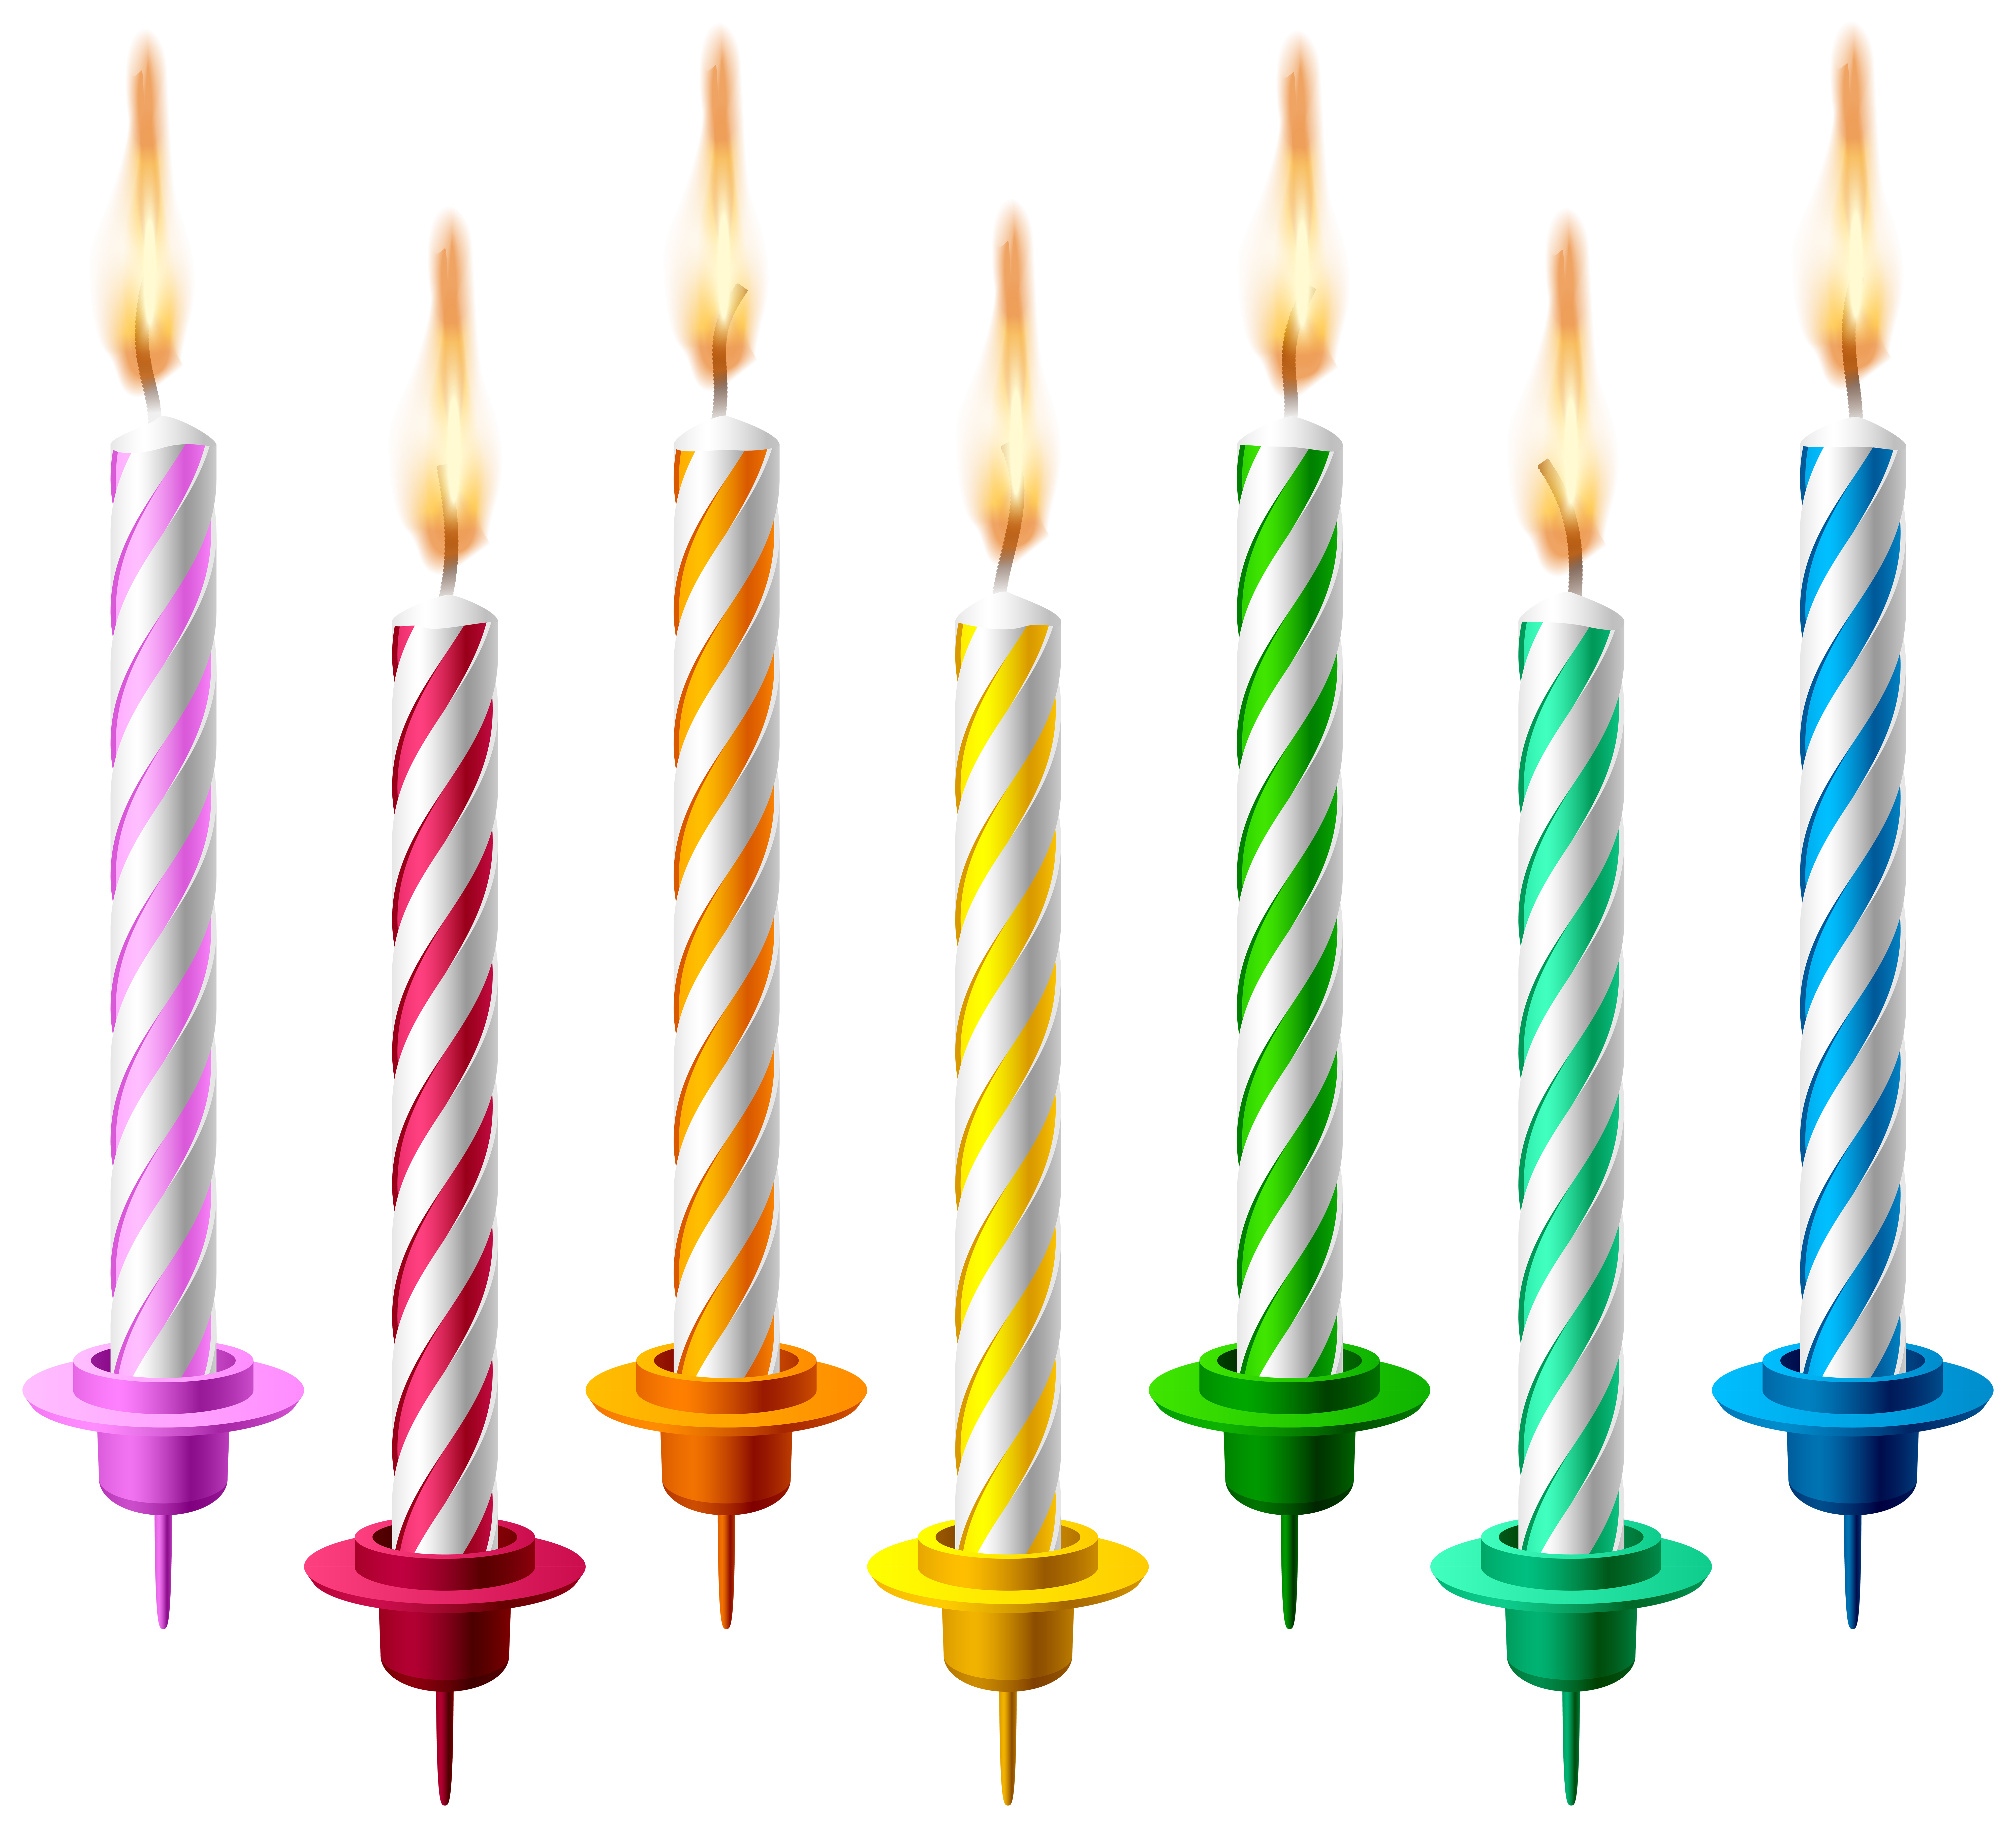 8000x7248 Birthday Candles Png Transparent Clip Art Imageu200b Gallery